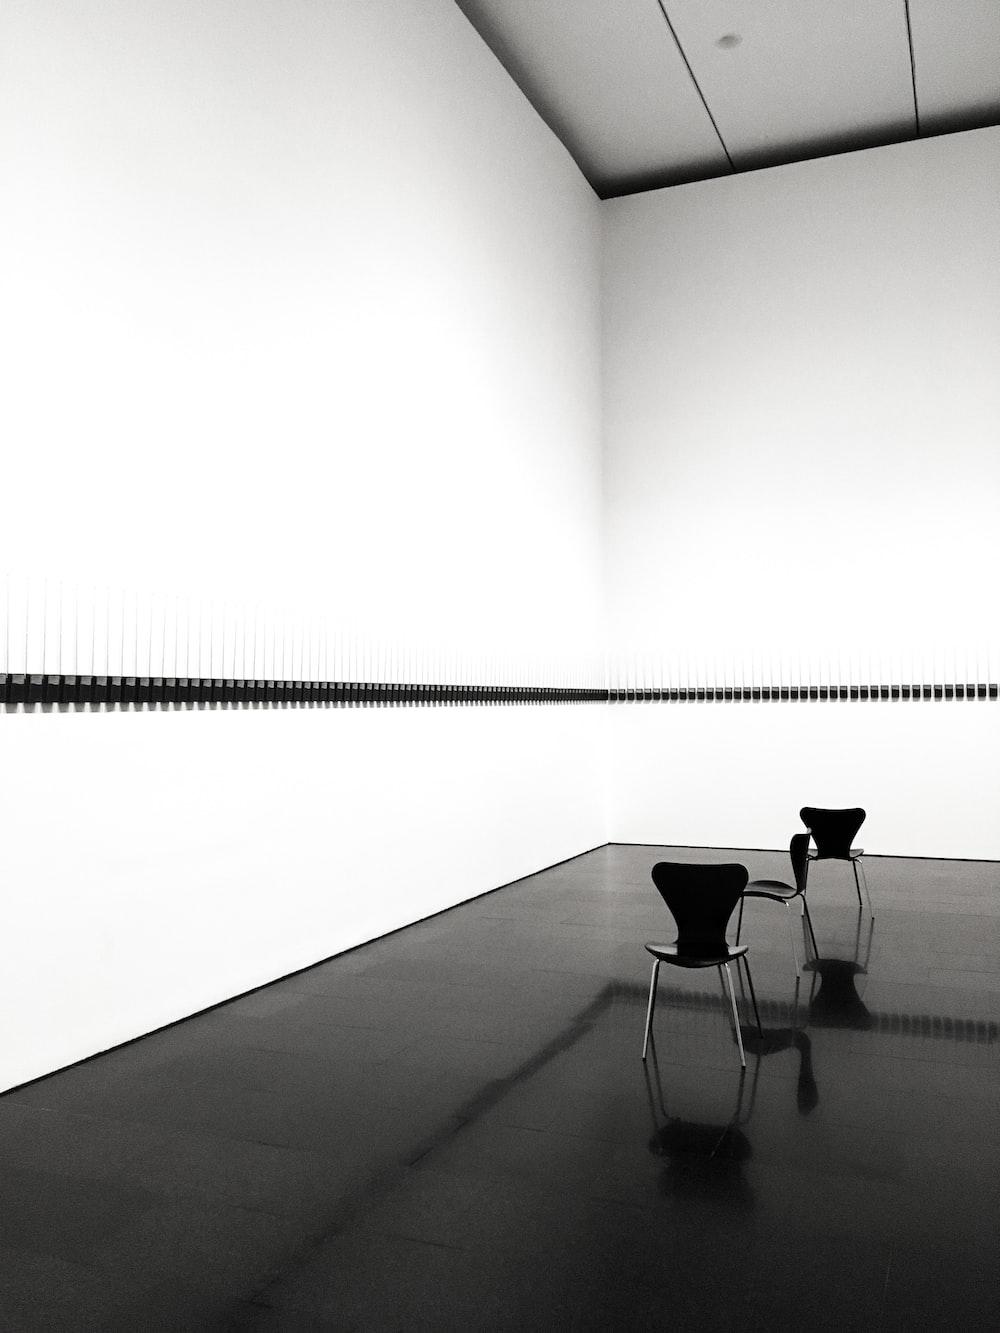 black chair on gray floor